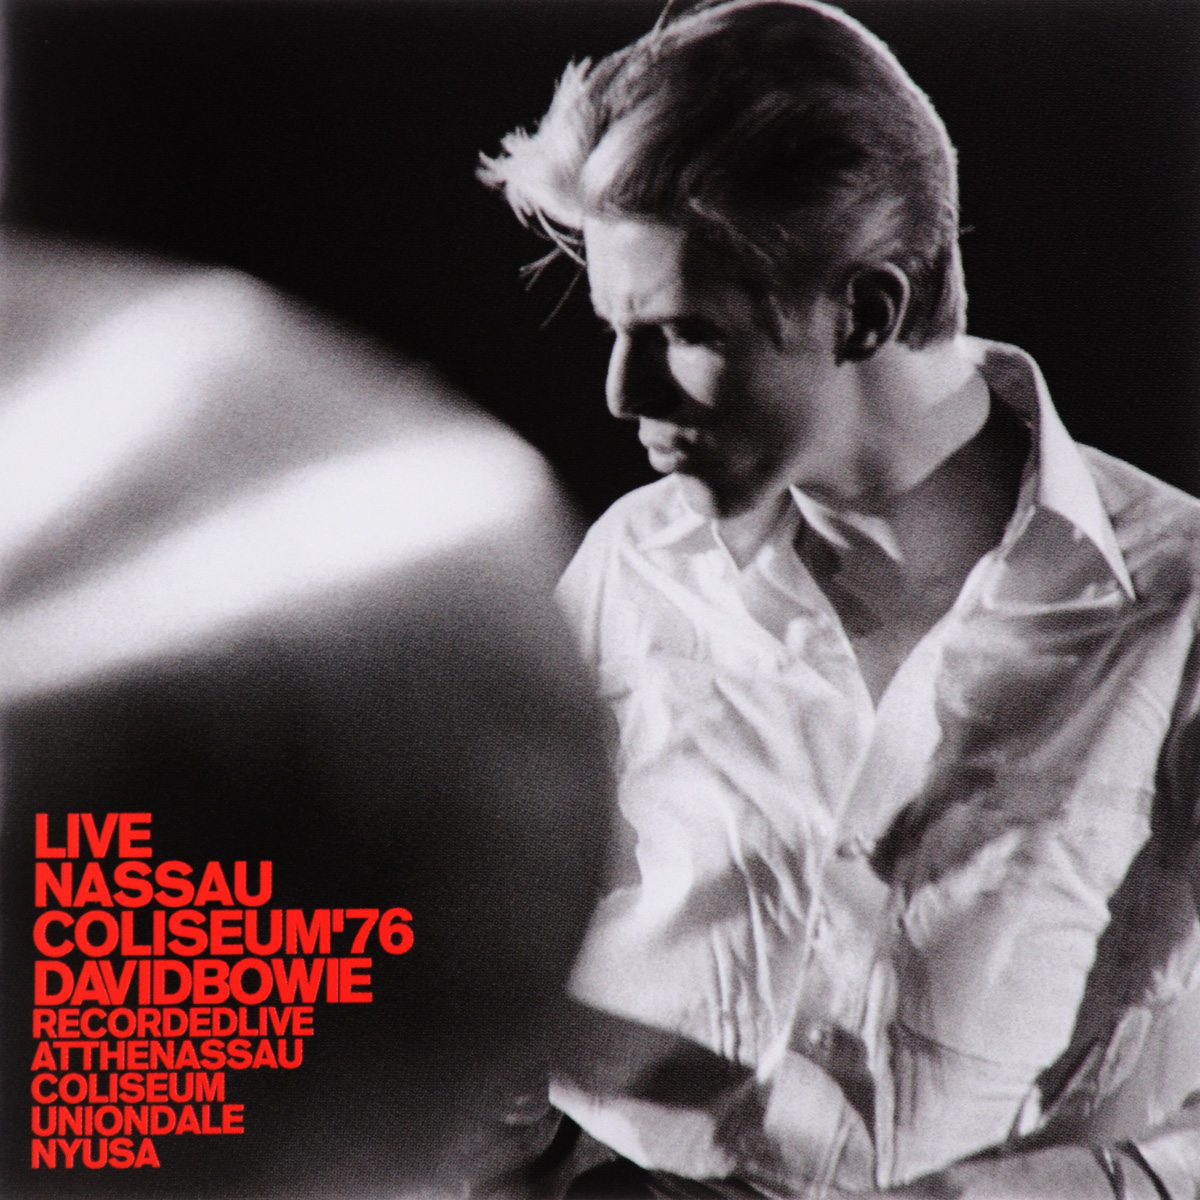 Дэвид Боуи David Bowie. Live Nassau Coliseum '76 (2 CD) david bowie blackstar cd